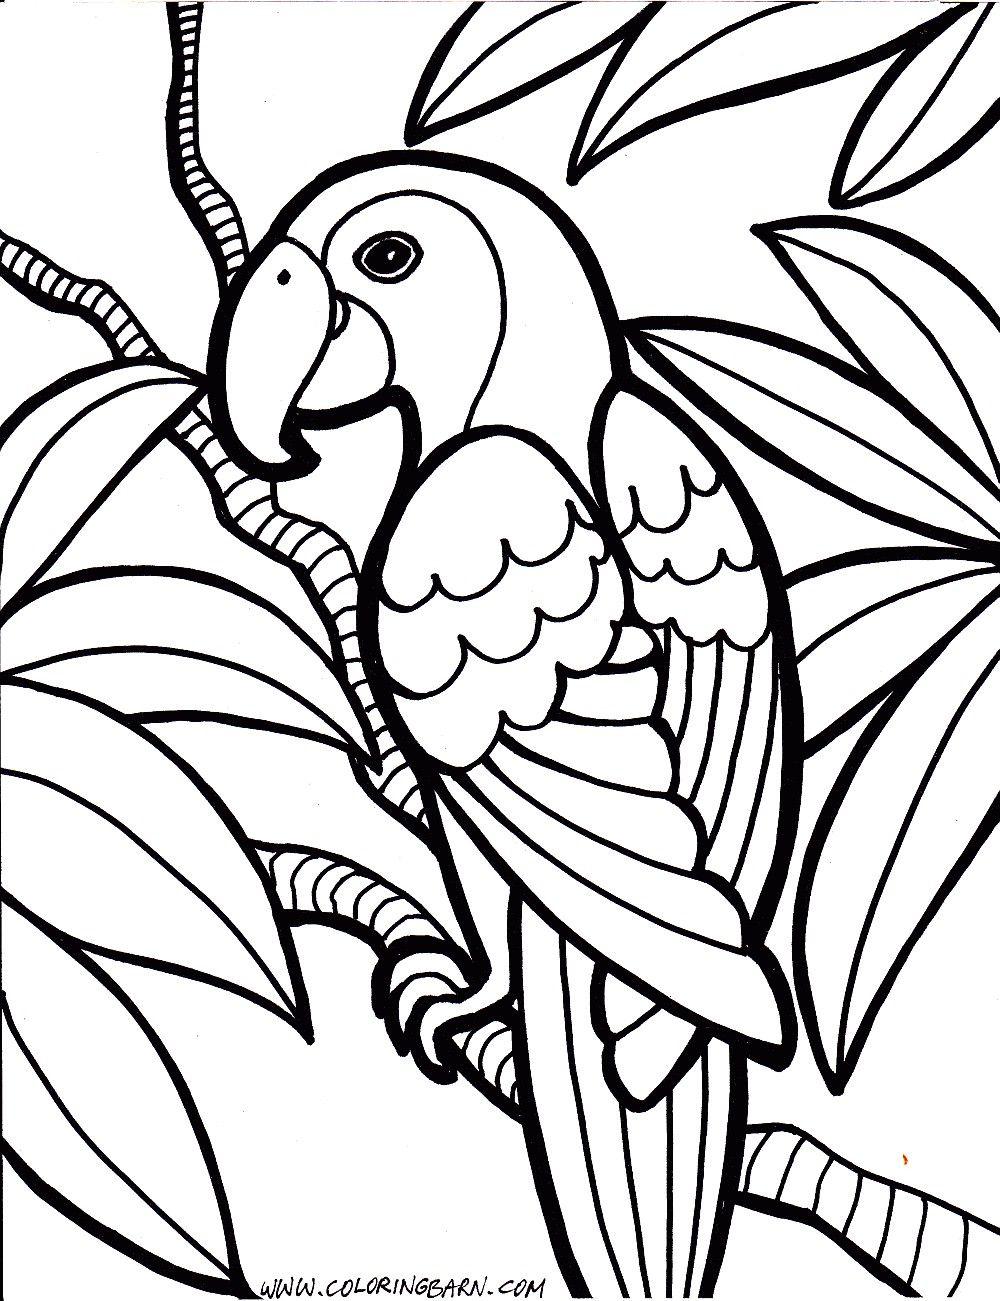 Bird Coloring Pages Bird Coloring Pages Telematik Institut Entitlementtrap Com Jungle Coloring Pages Bird Coloring Pages Animal Coloring Pages